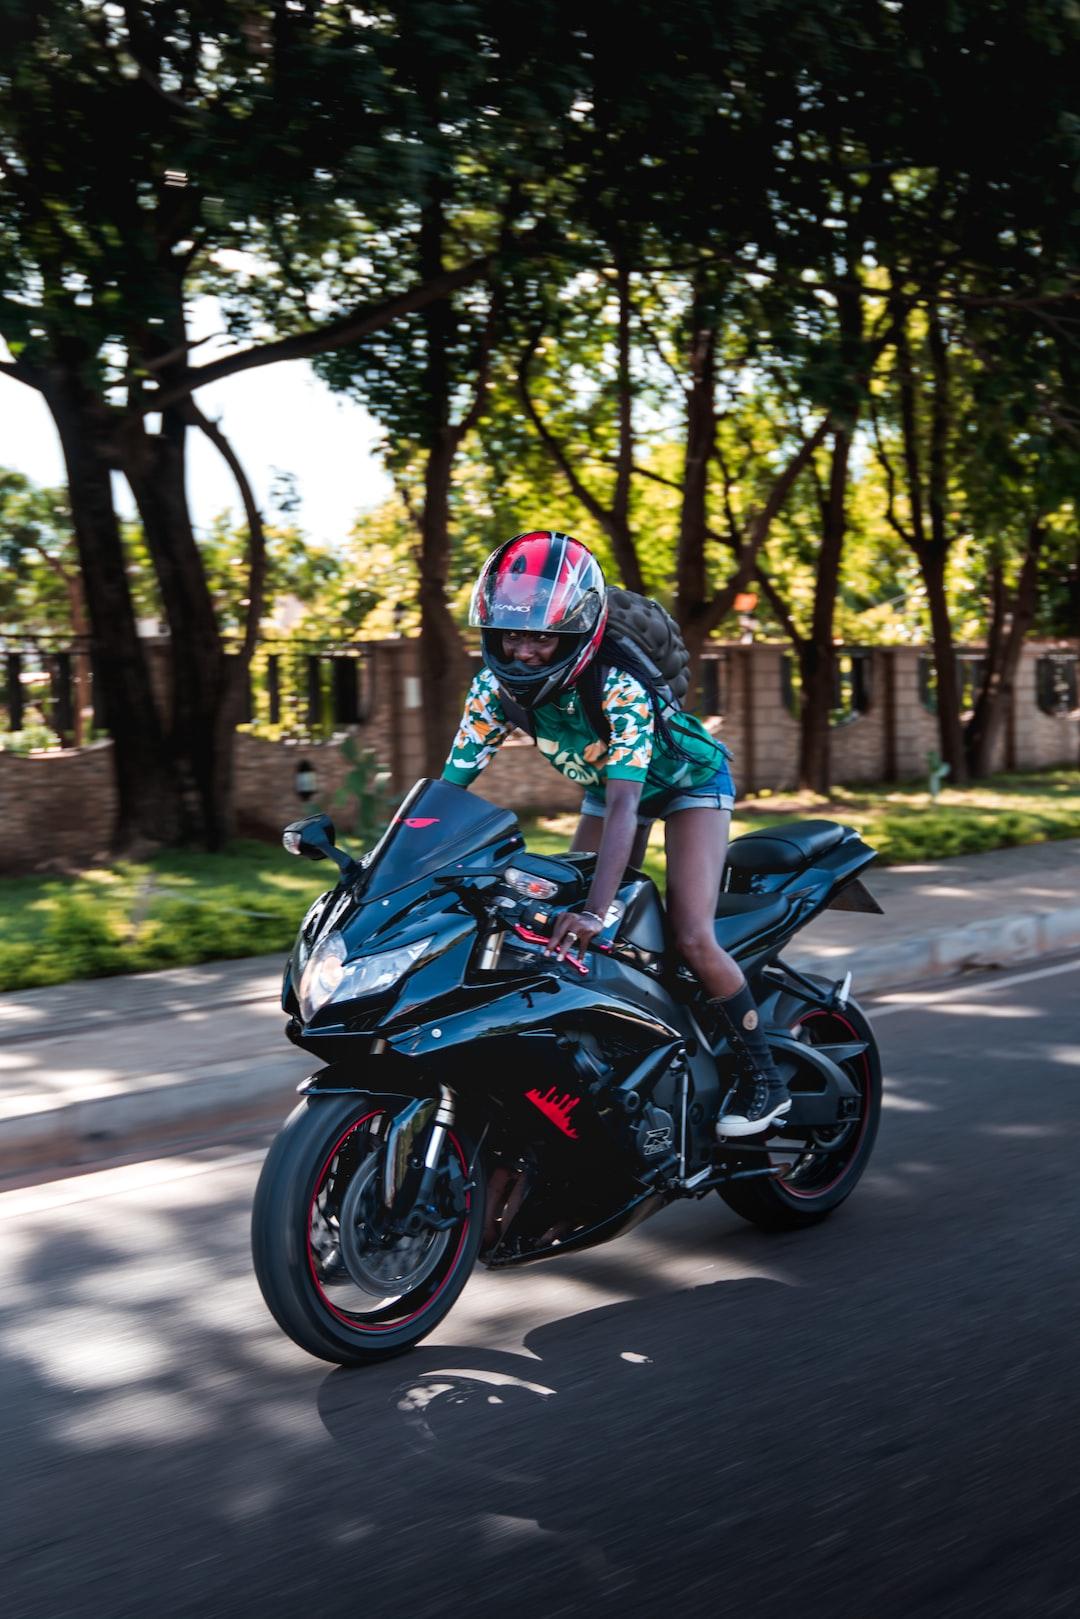 biker chick motorcycle woman unsplash dasg street sport